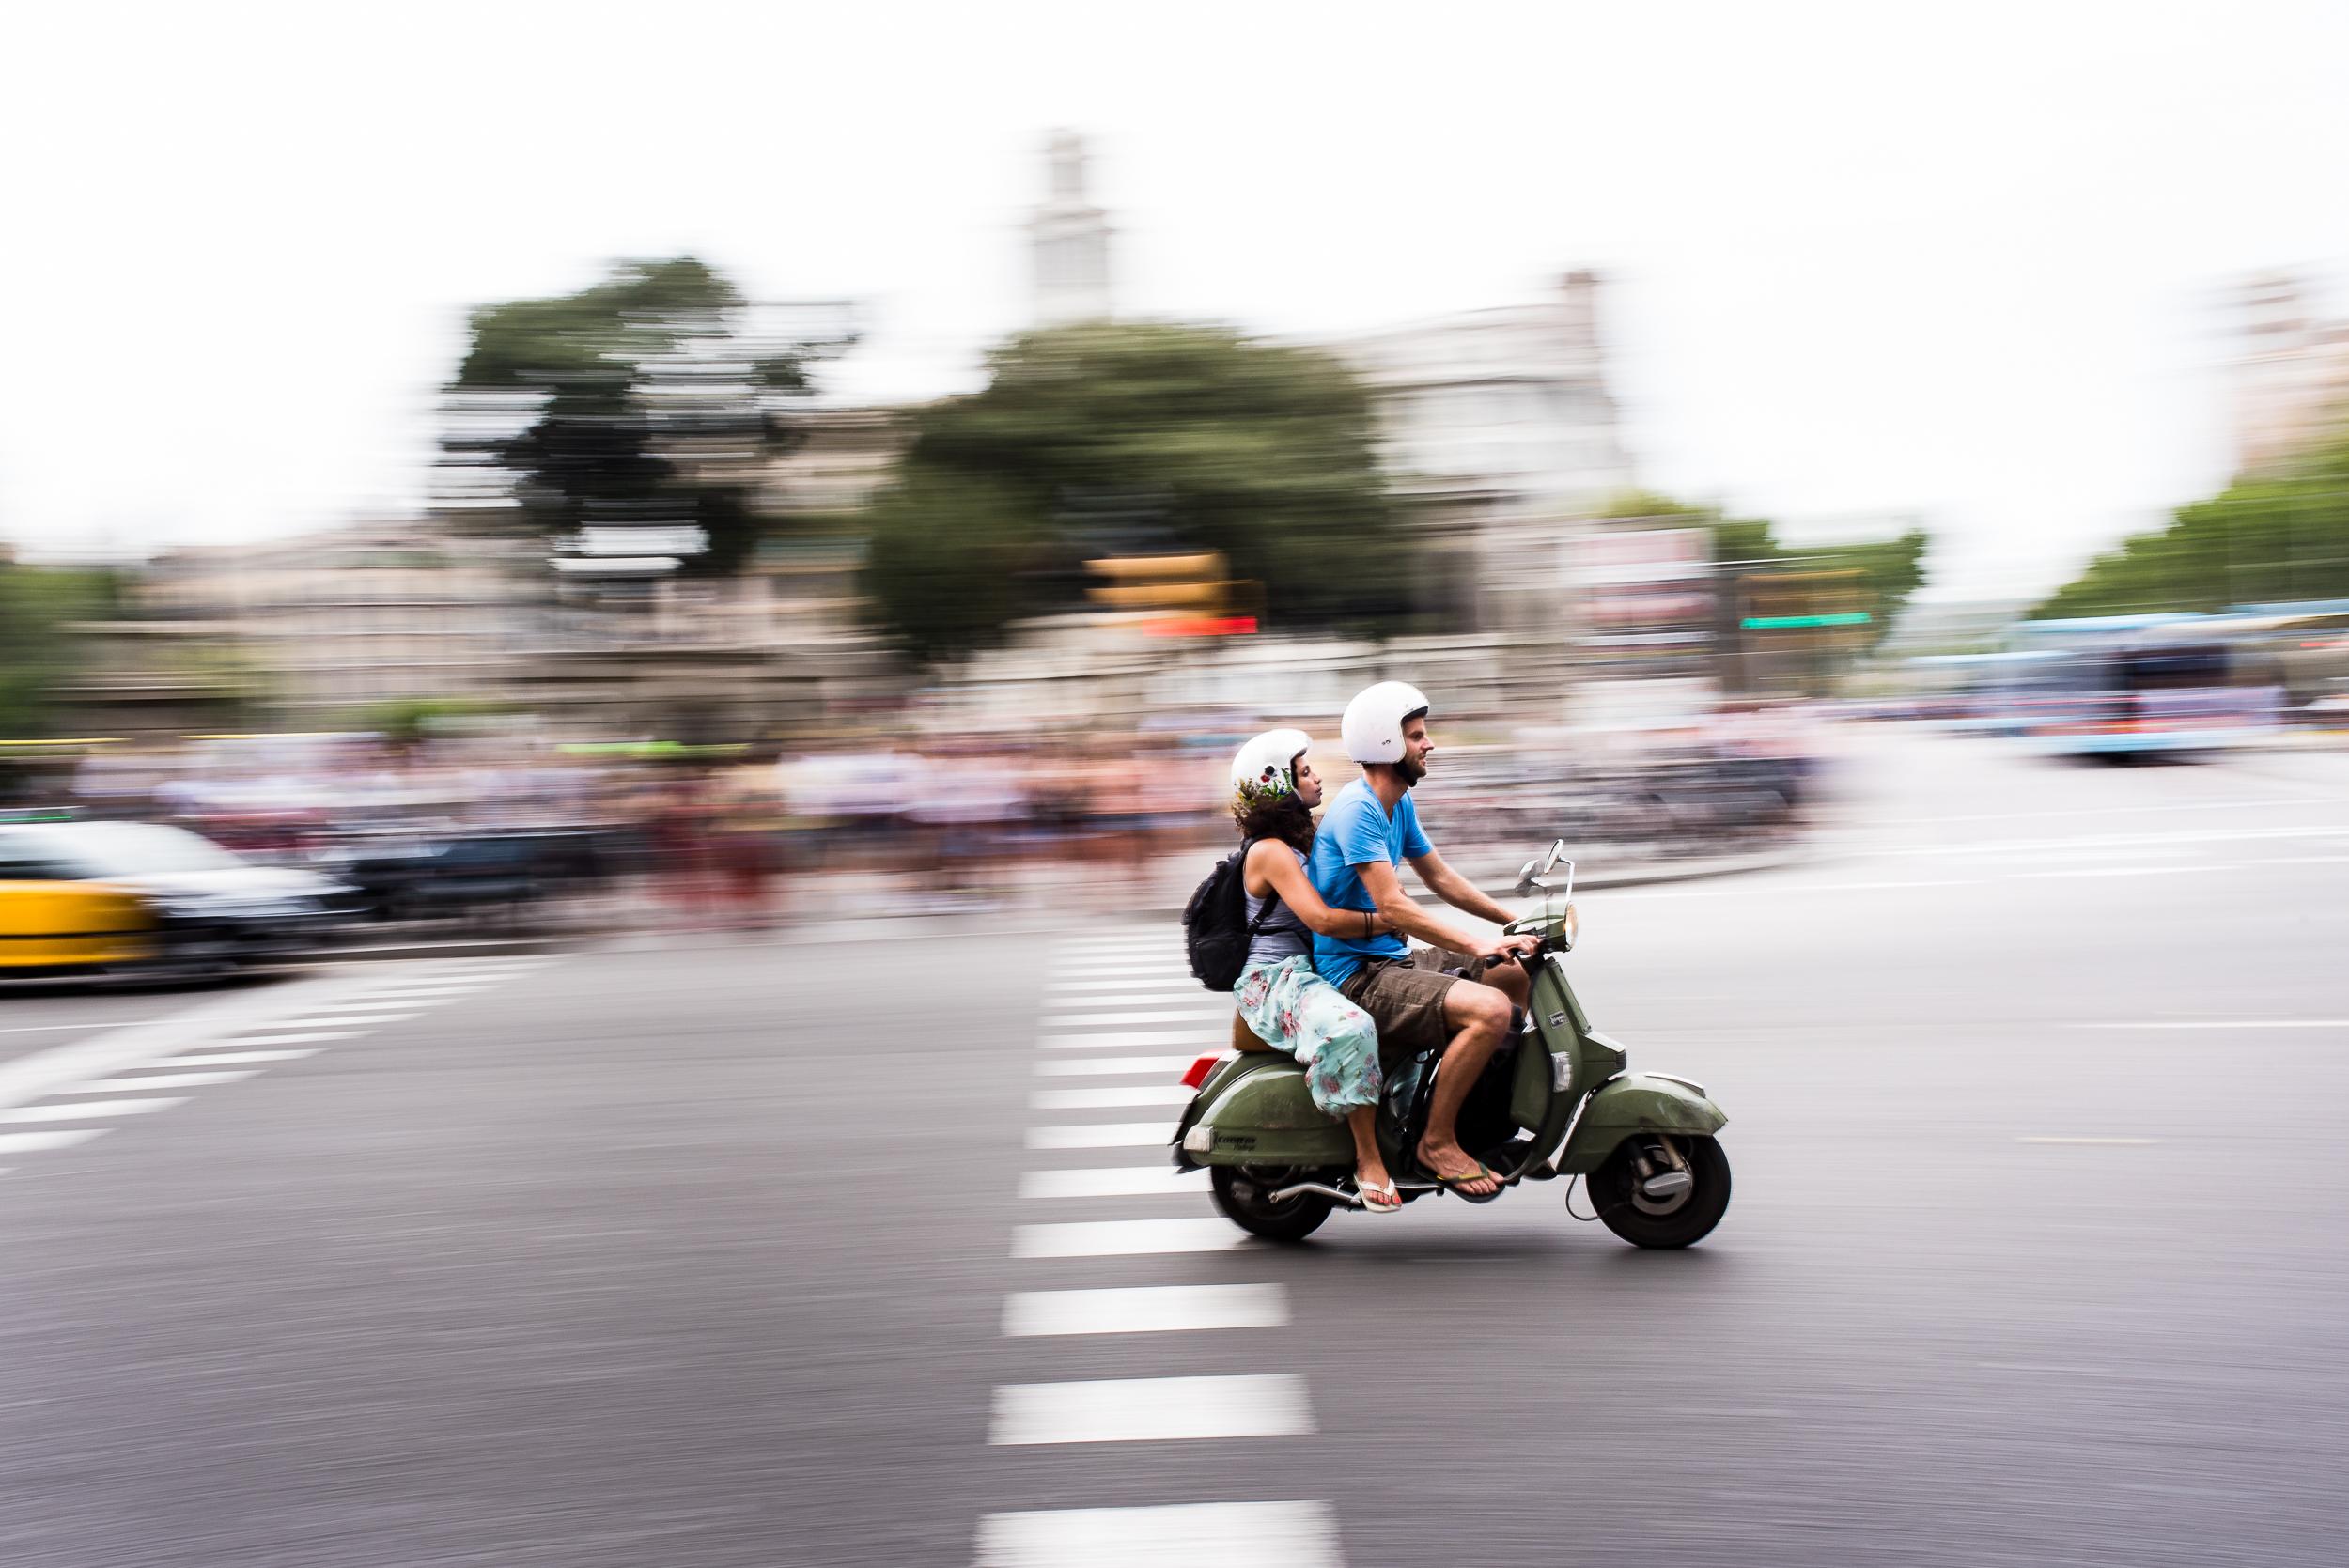 Vespa ride, Barcelona